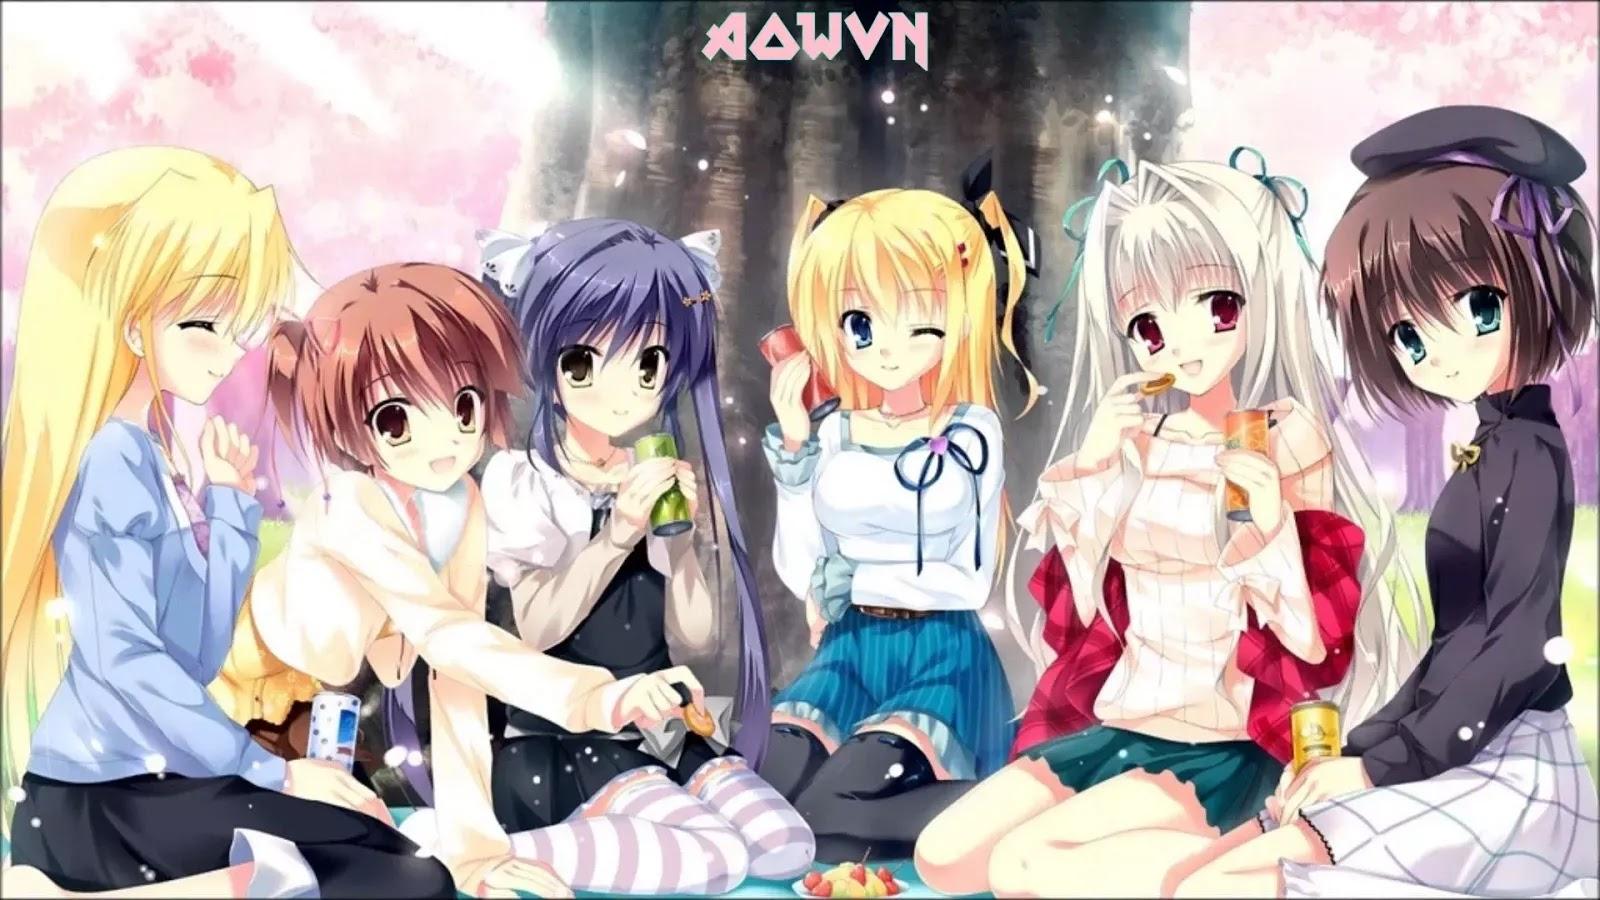 AowVN%2B%25284%2529 - [ Anime 3gp Mp4 ] Da Capo SS1 + SS2 + SS3 + OVA + Special | Vietsub Harem Tình yêu Huyền thoại